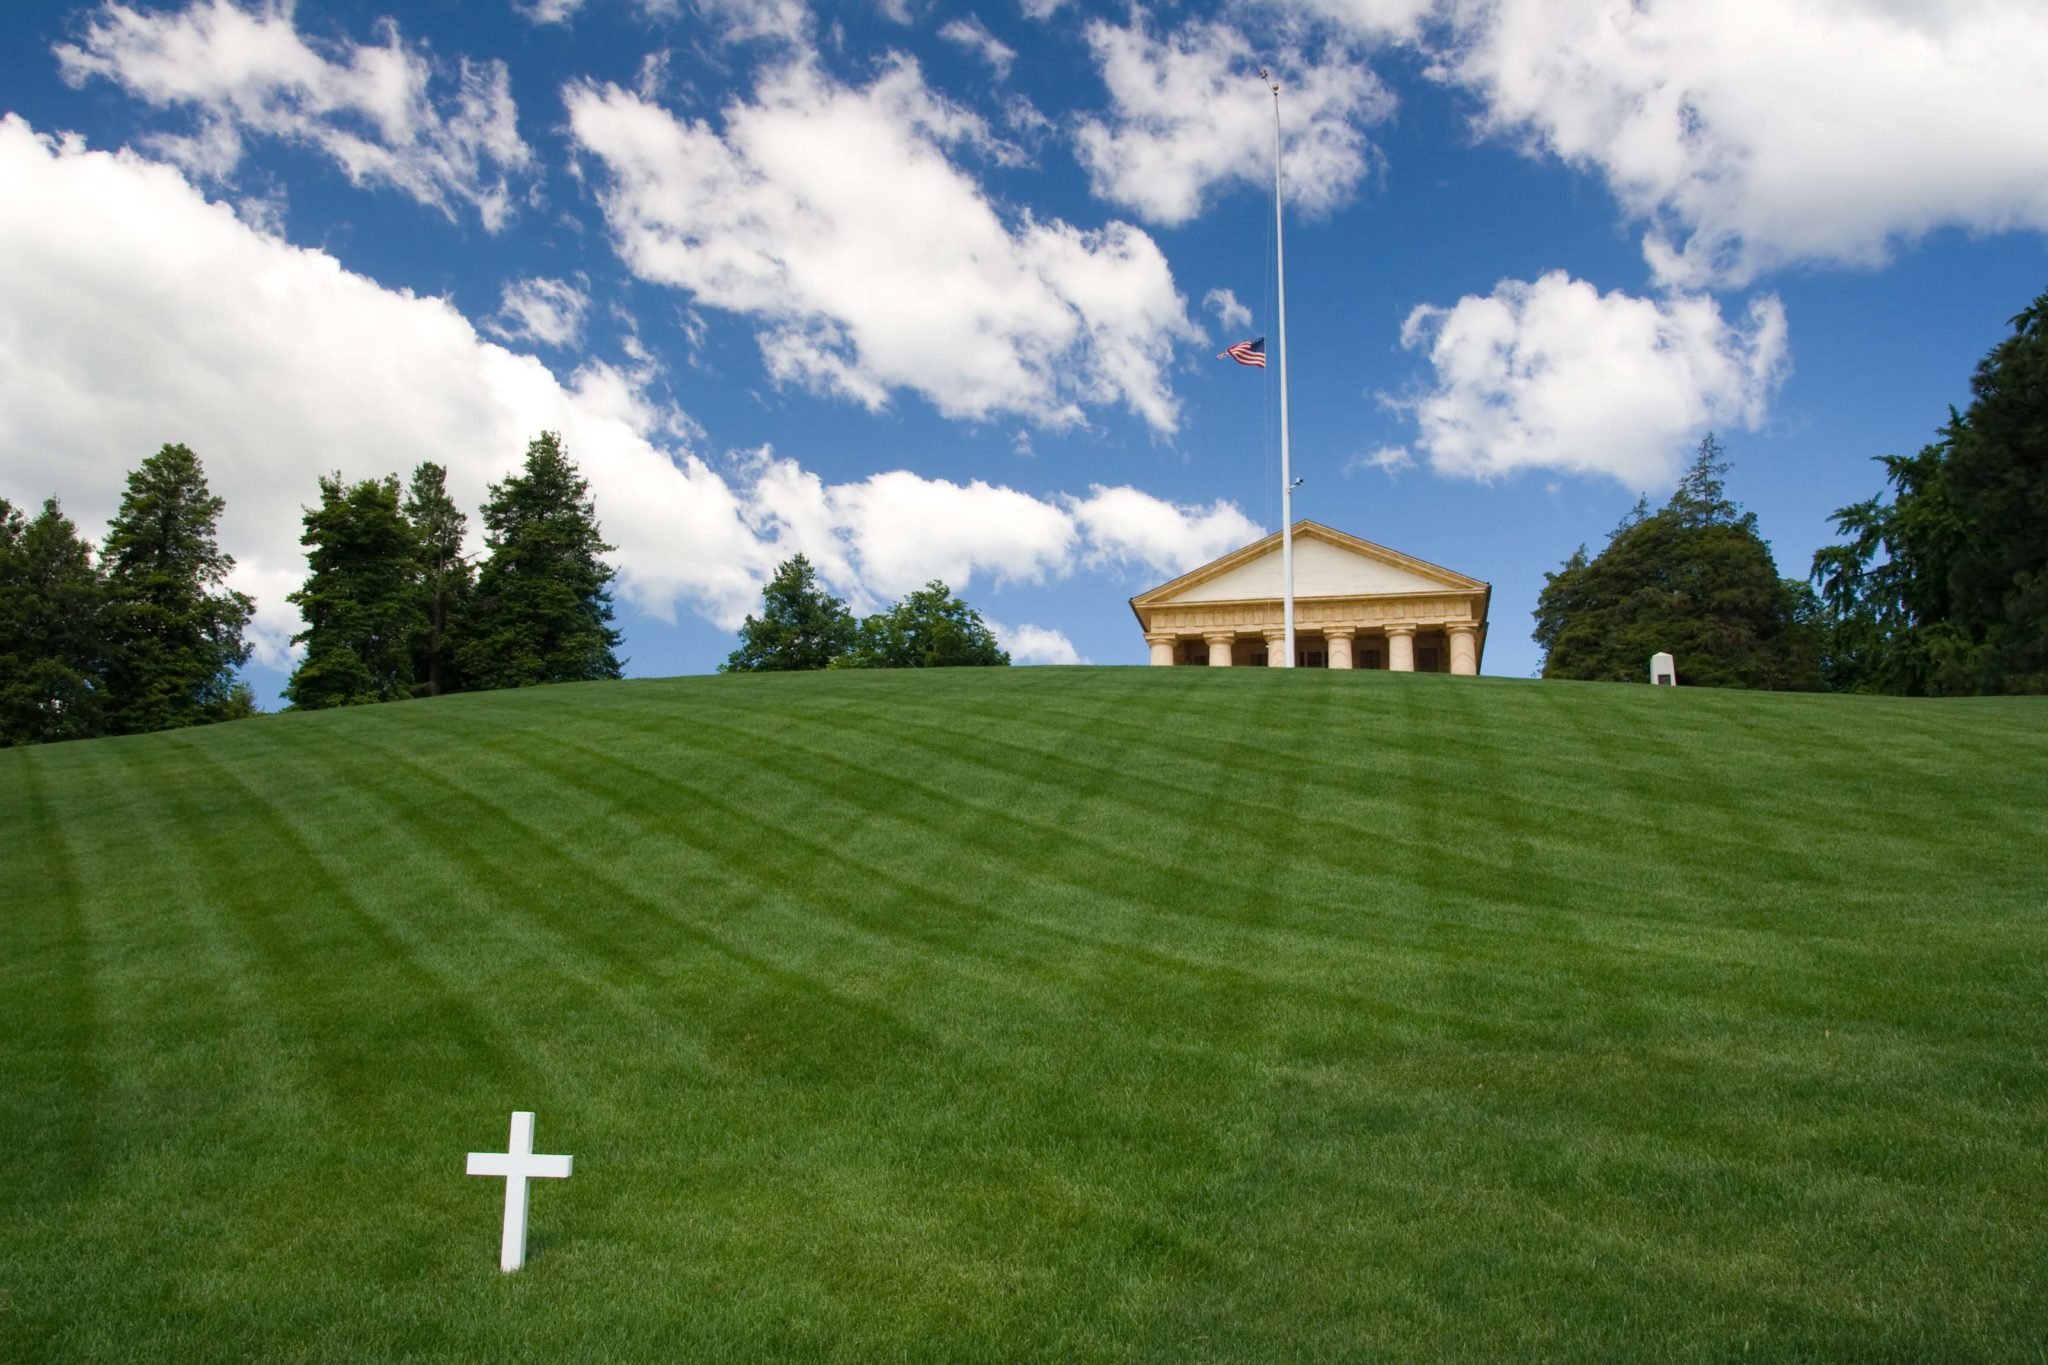 Arlington House – An Interesting Circle of Karma